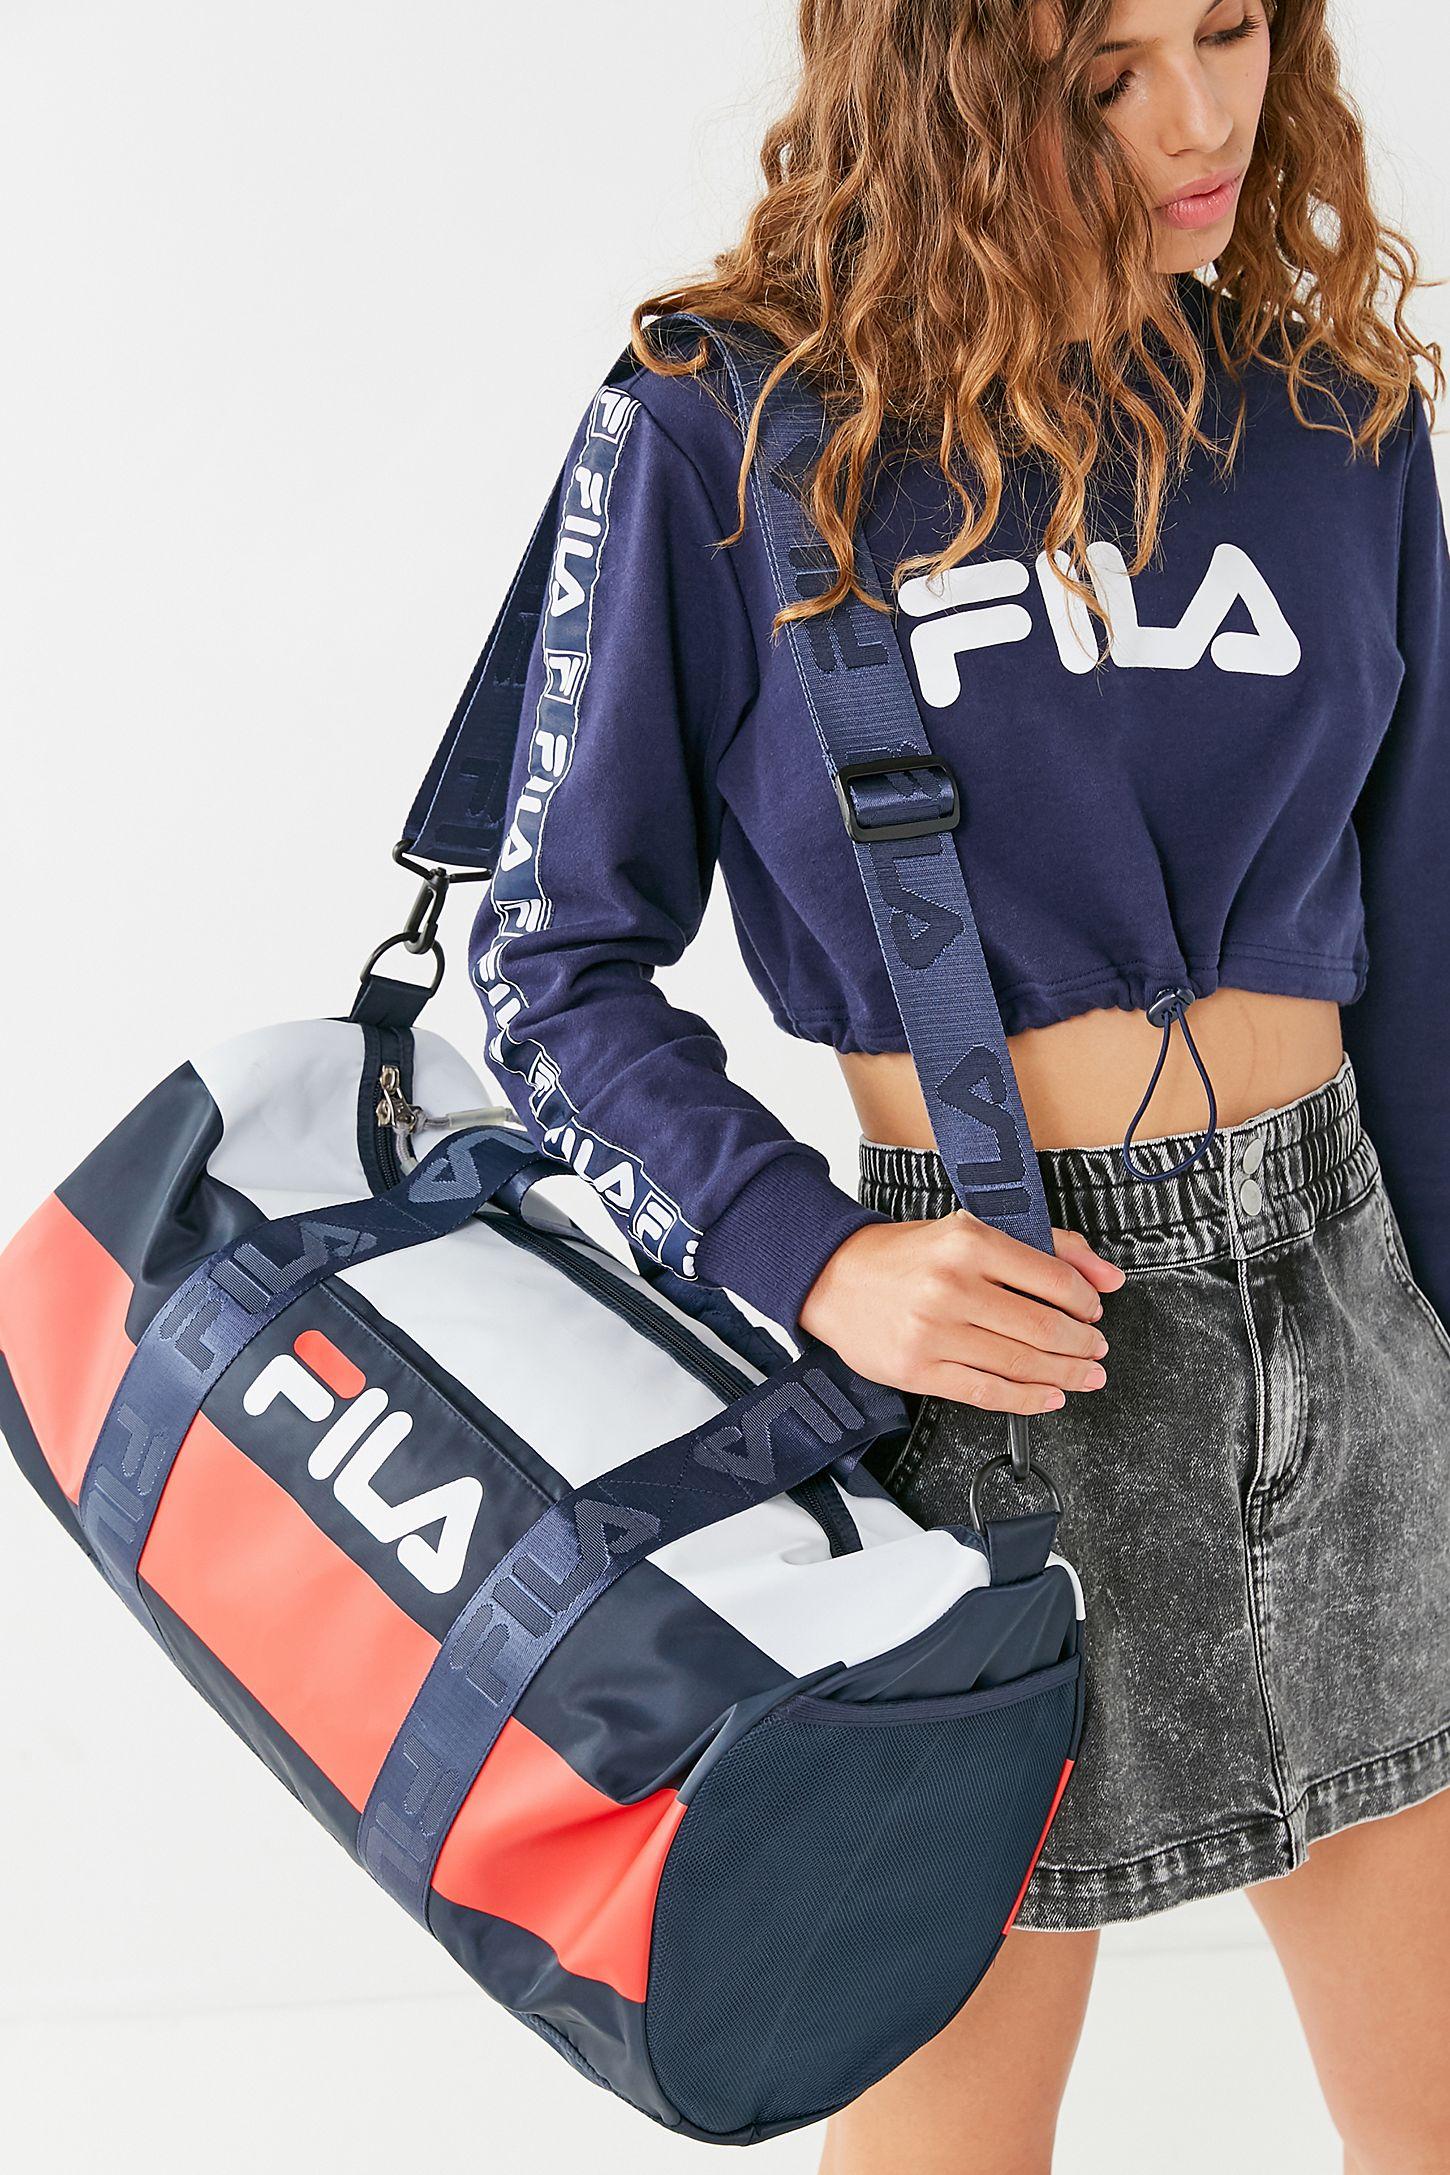 FILA Major Stripe Duffle Bag  7c97eec634b16